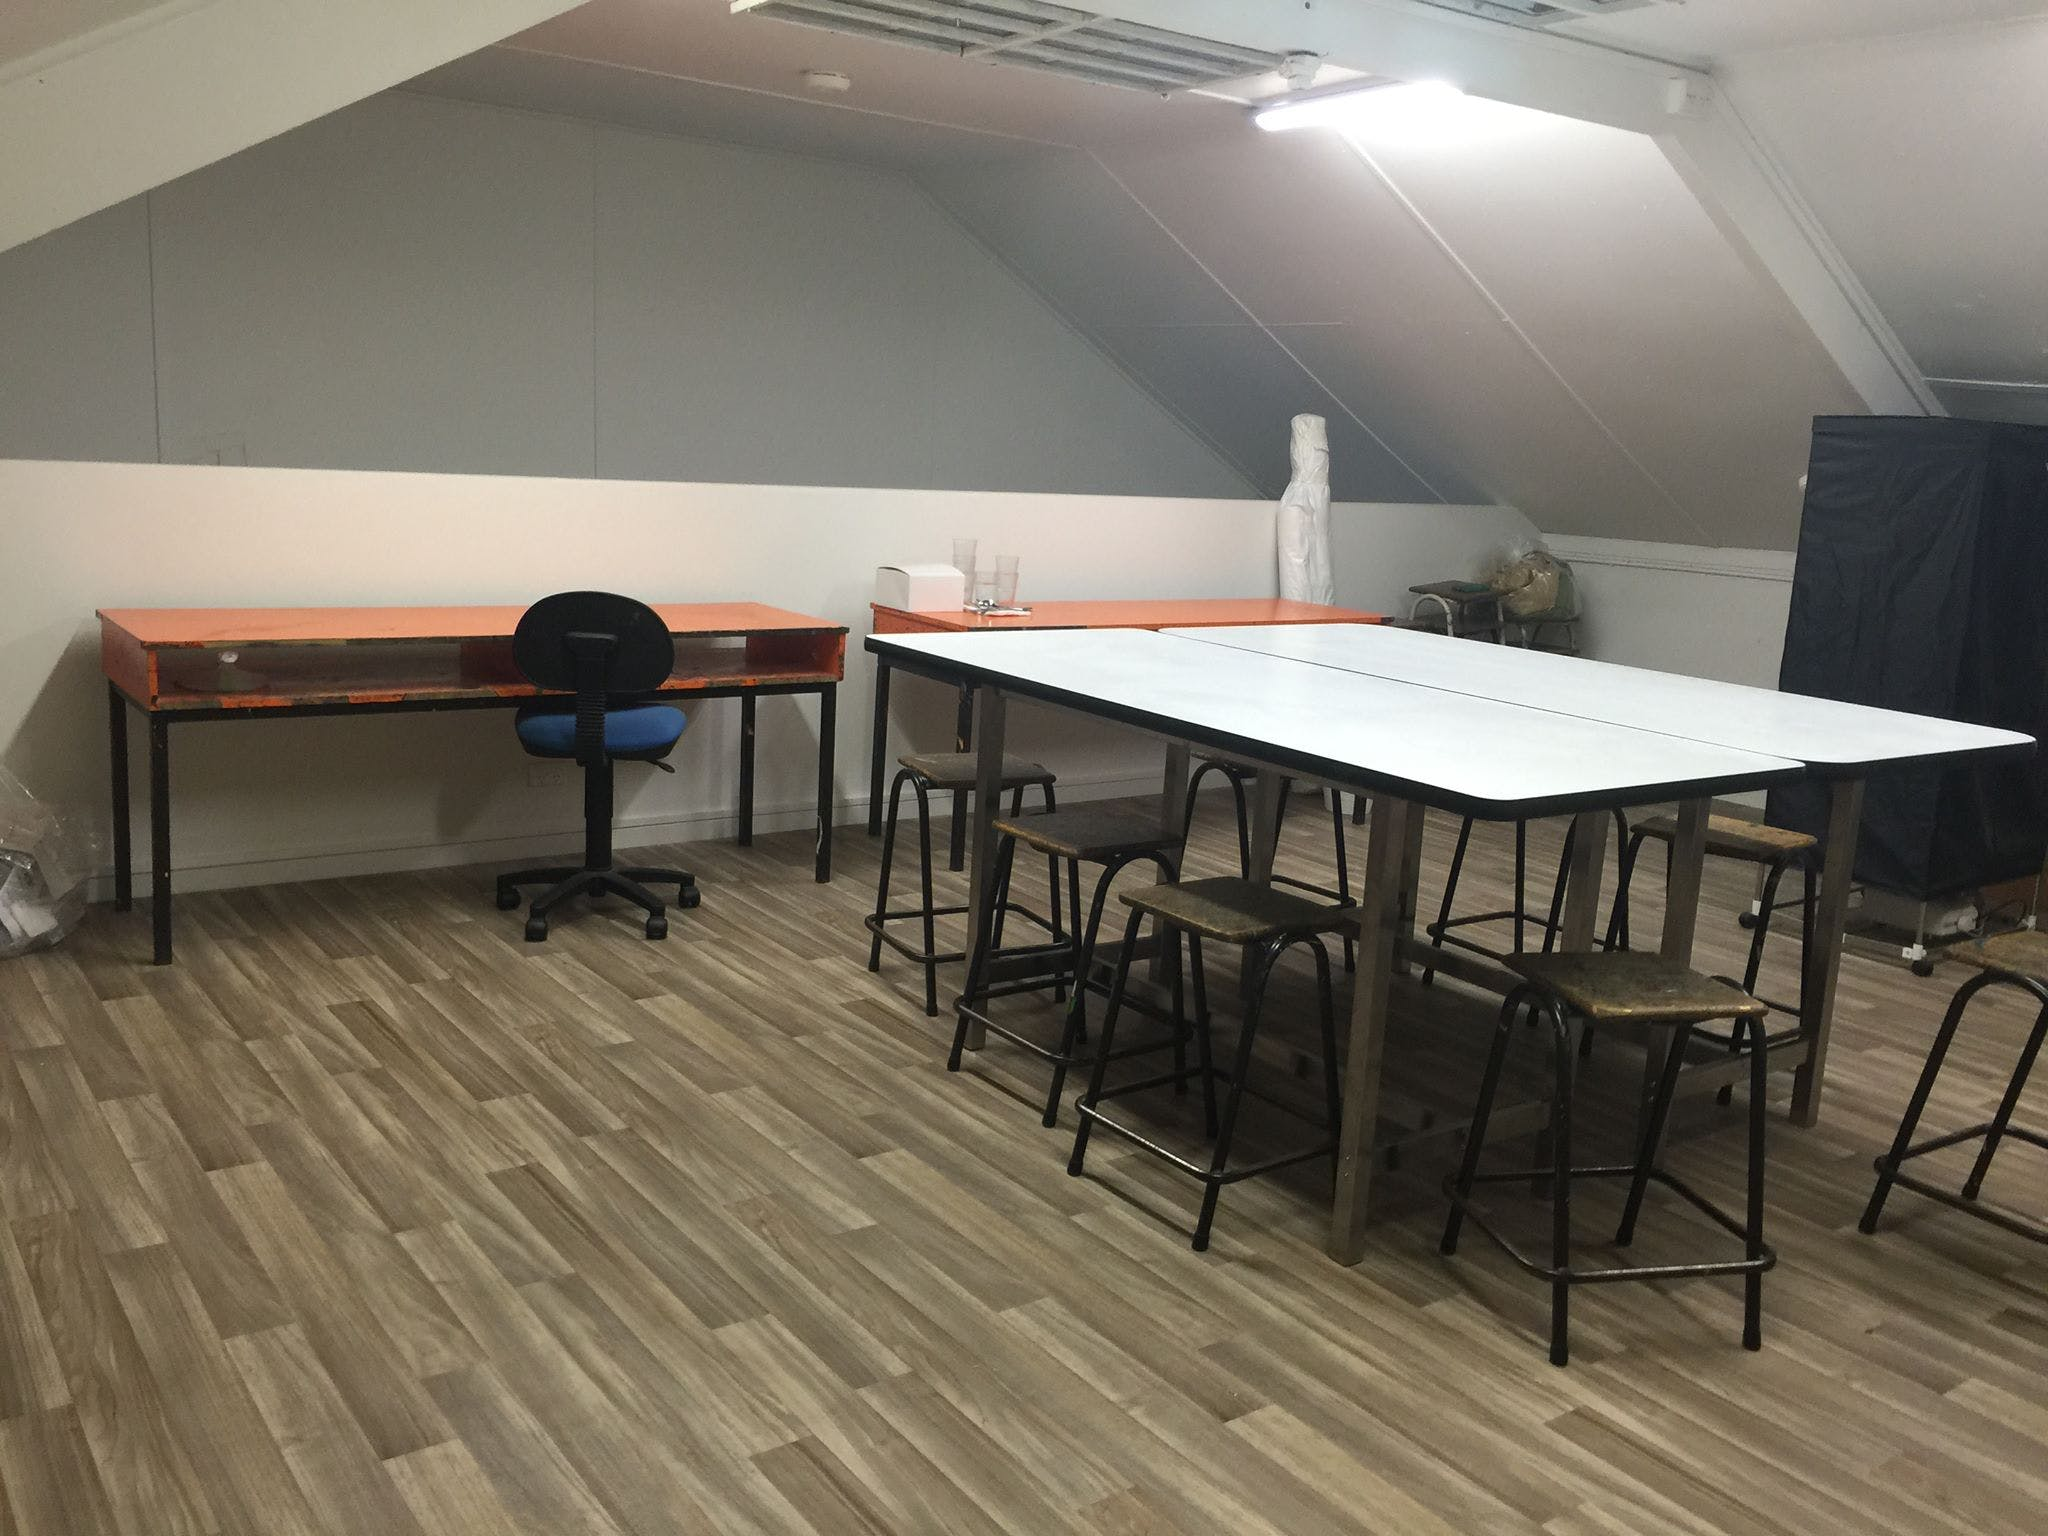 Mezzanine Open Plan Studio, multi-use area at Far Fetched Designs, image 1